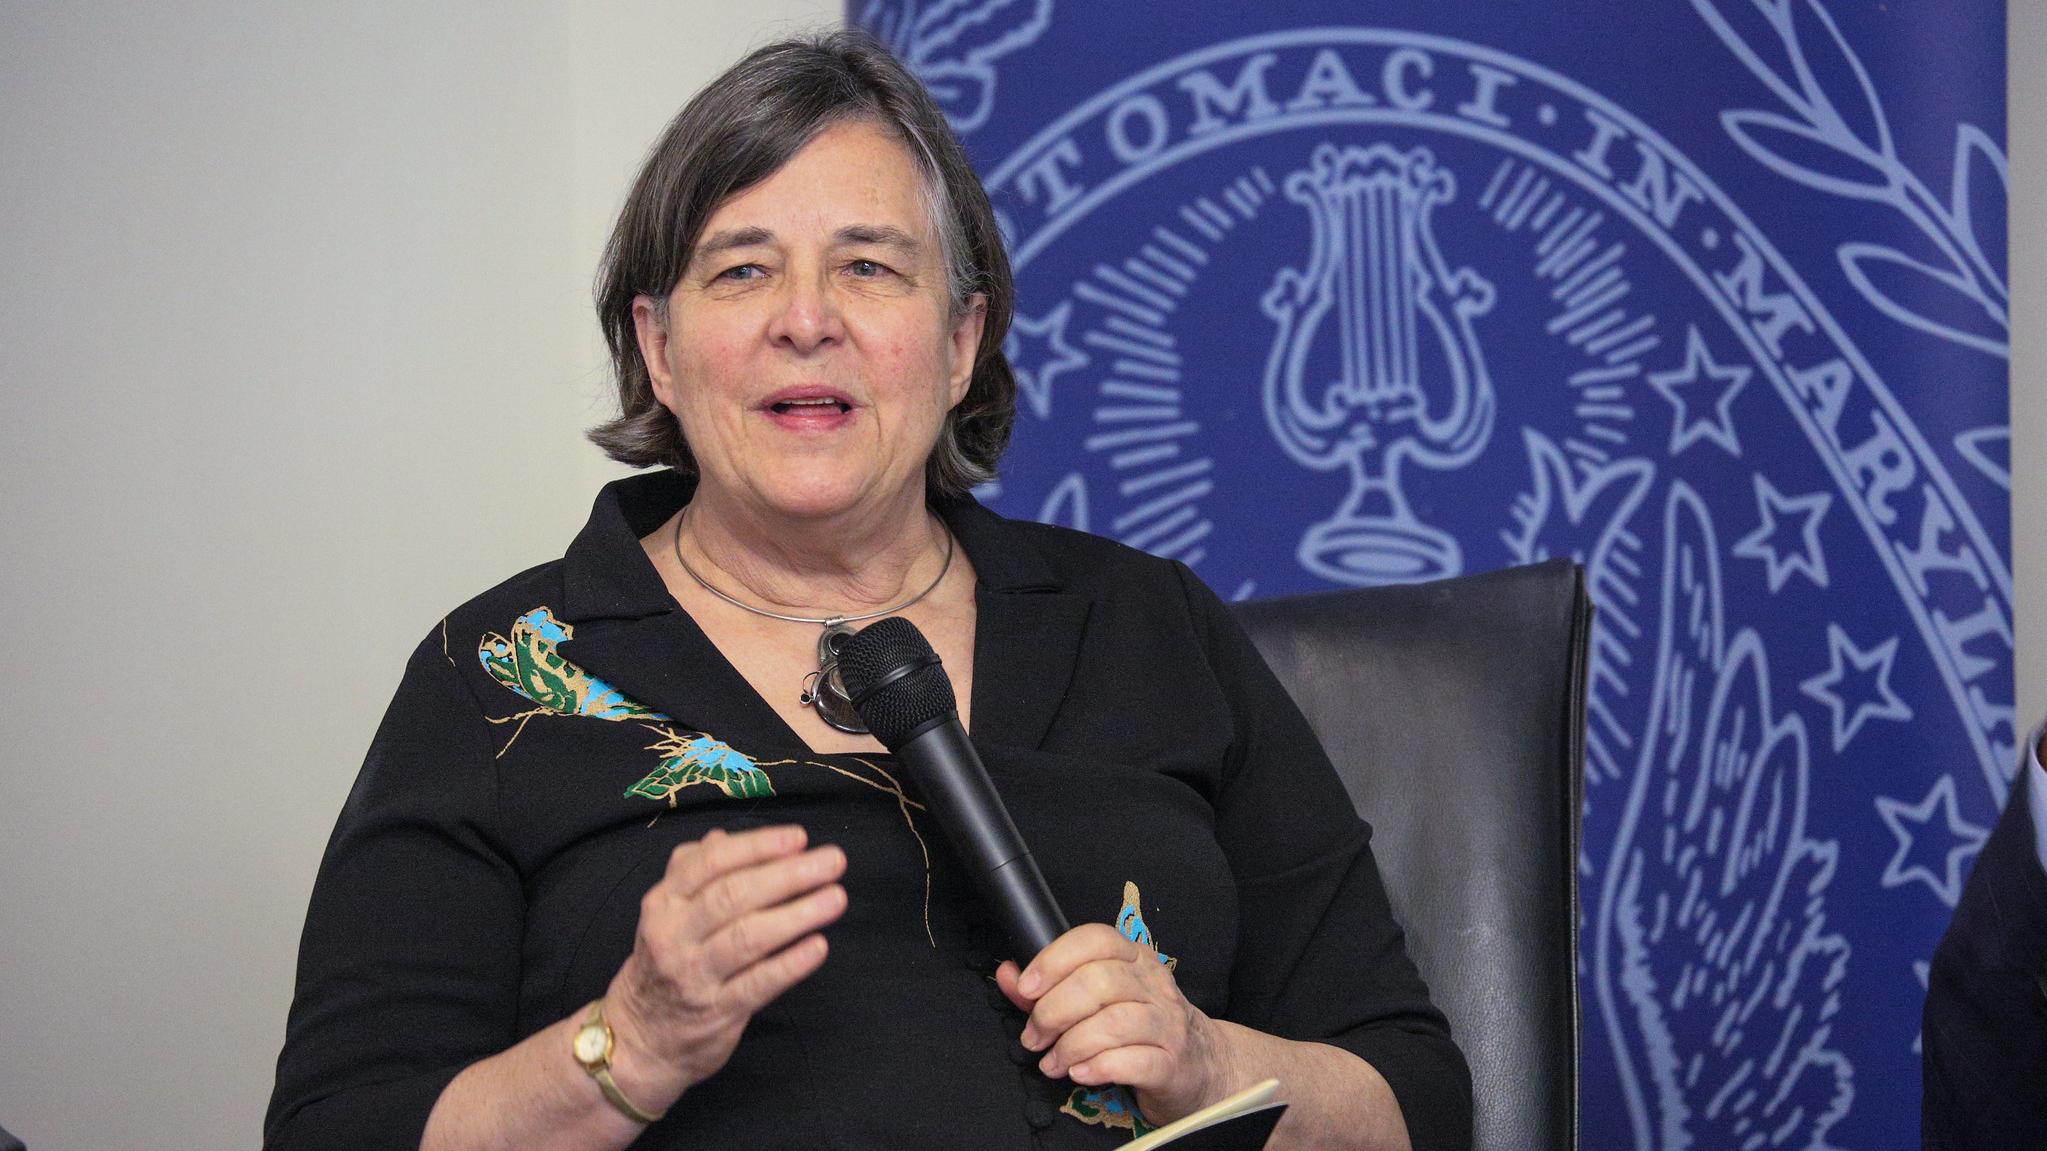 Berkley Center Senior Fellow Katherine Marshall contributed her insights.